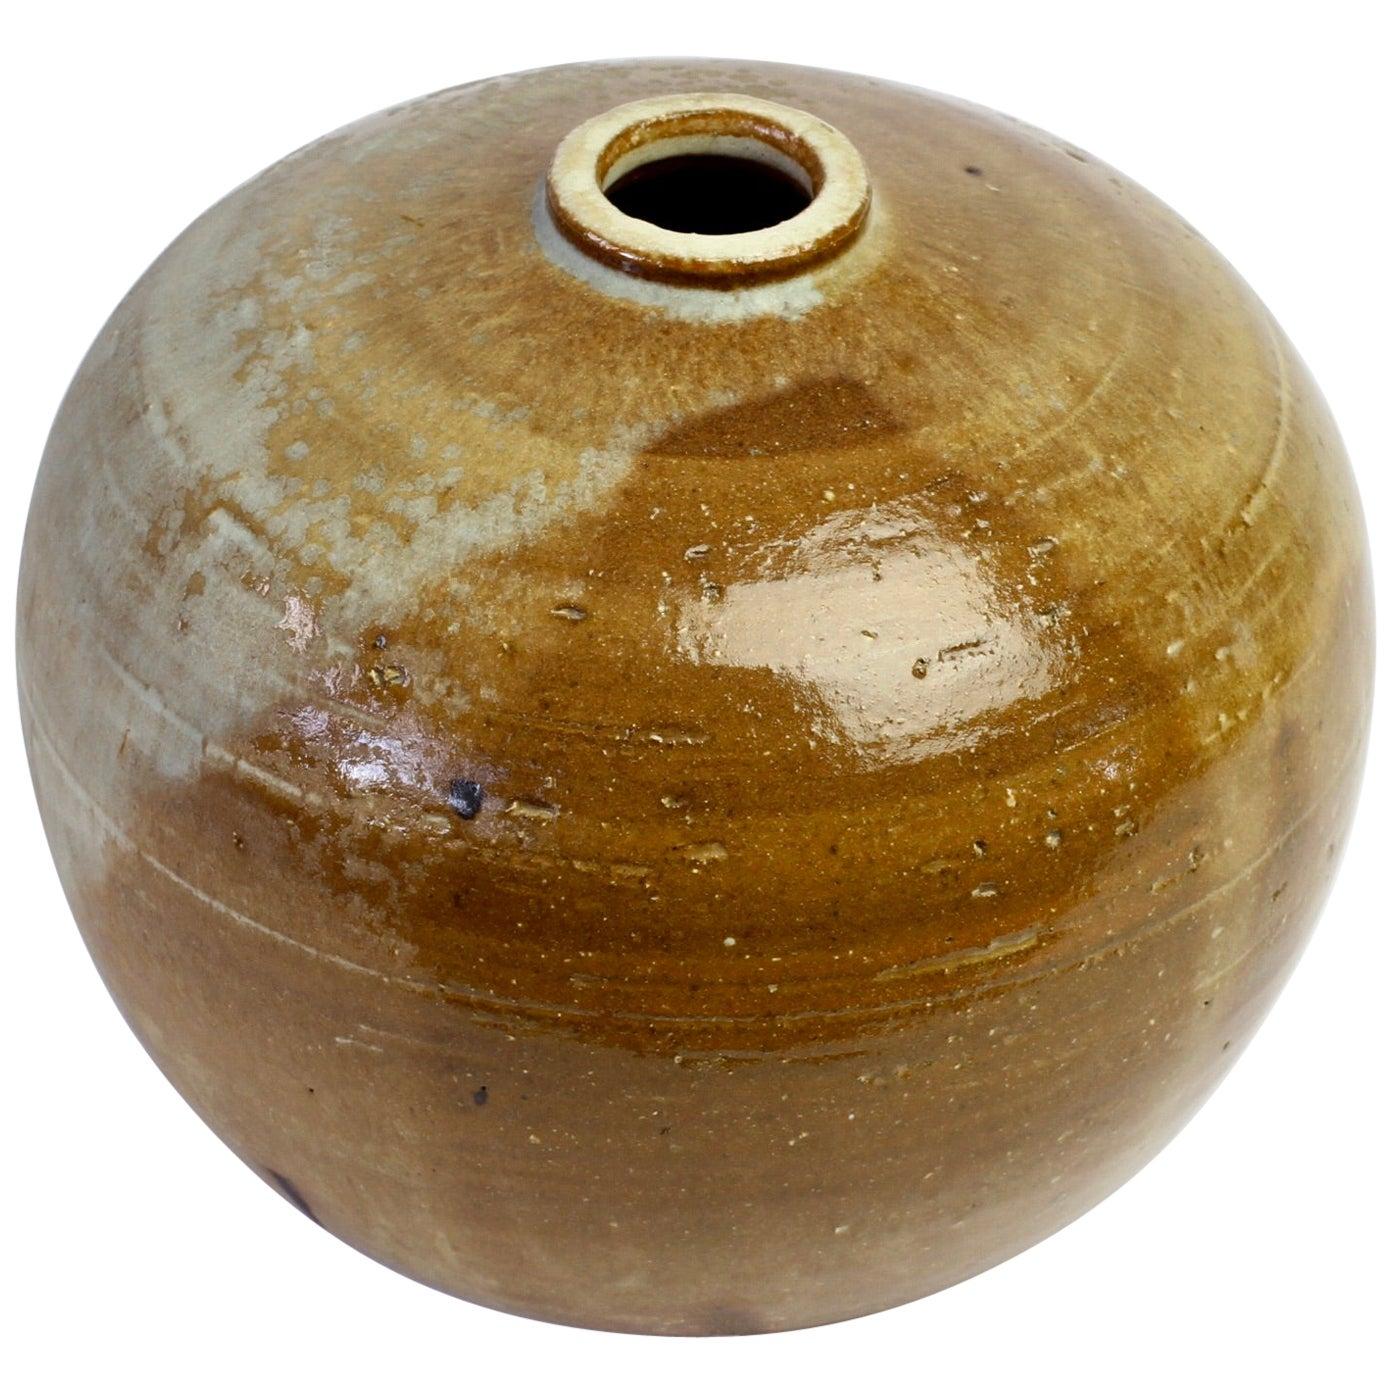 Vintage Glazed Signed European Art Studio Stoneware Pottery Vase or Vessel